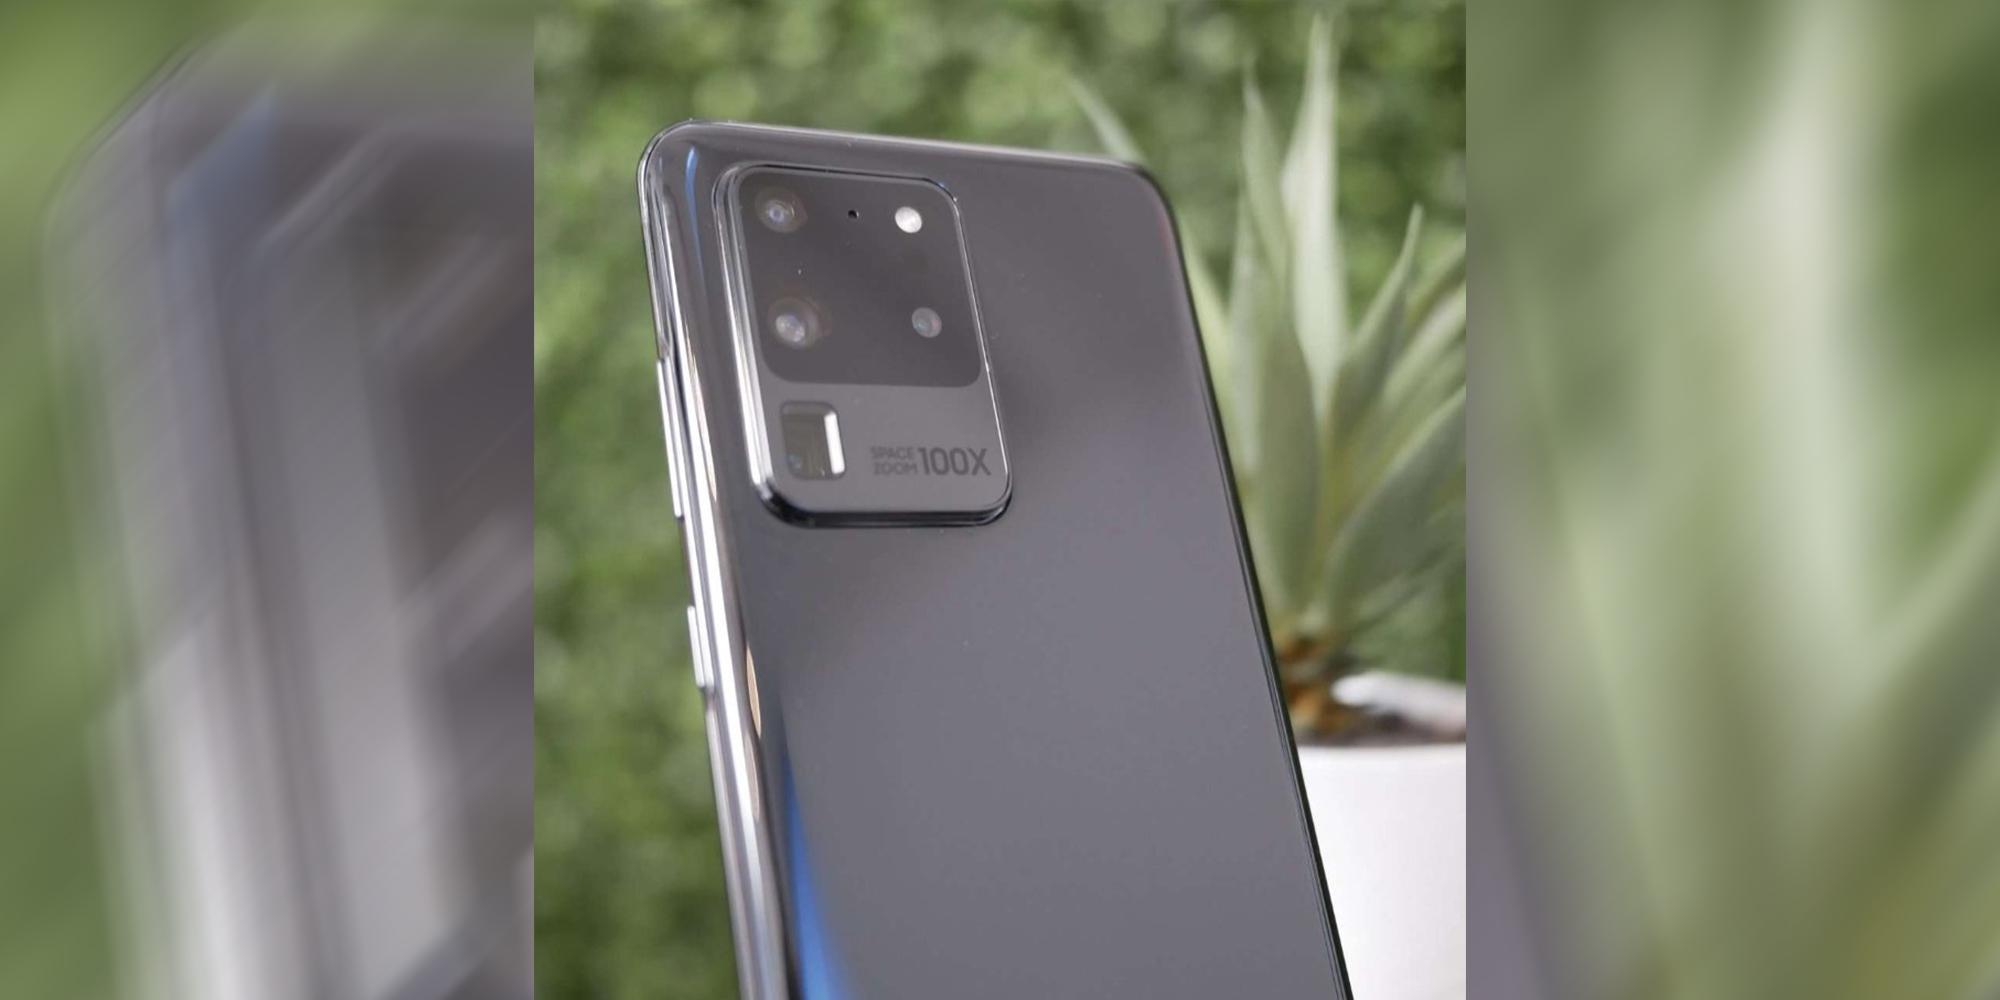 Samsung Galaxy S20 Ultra hands-on leak